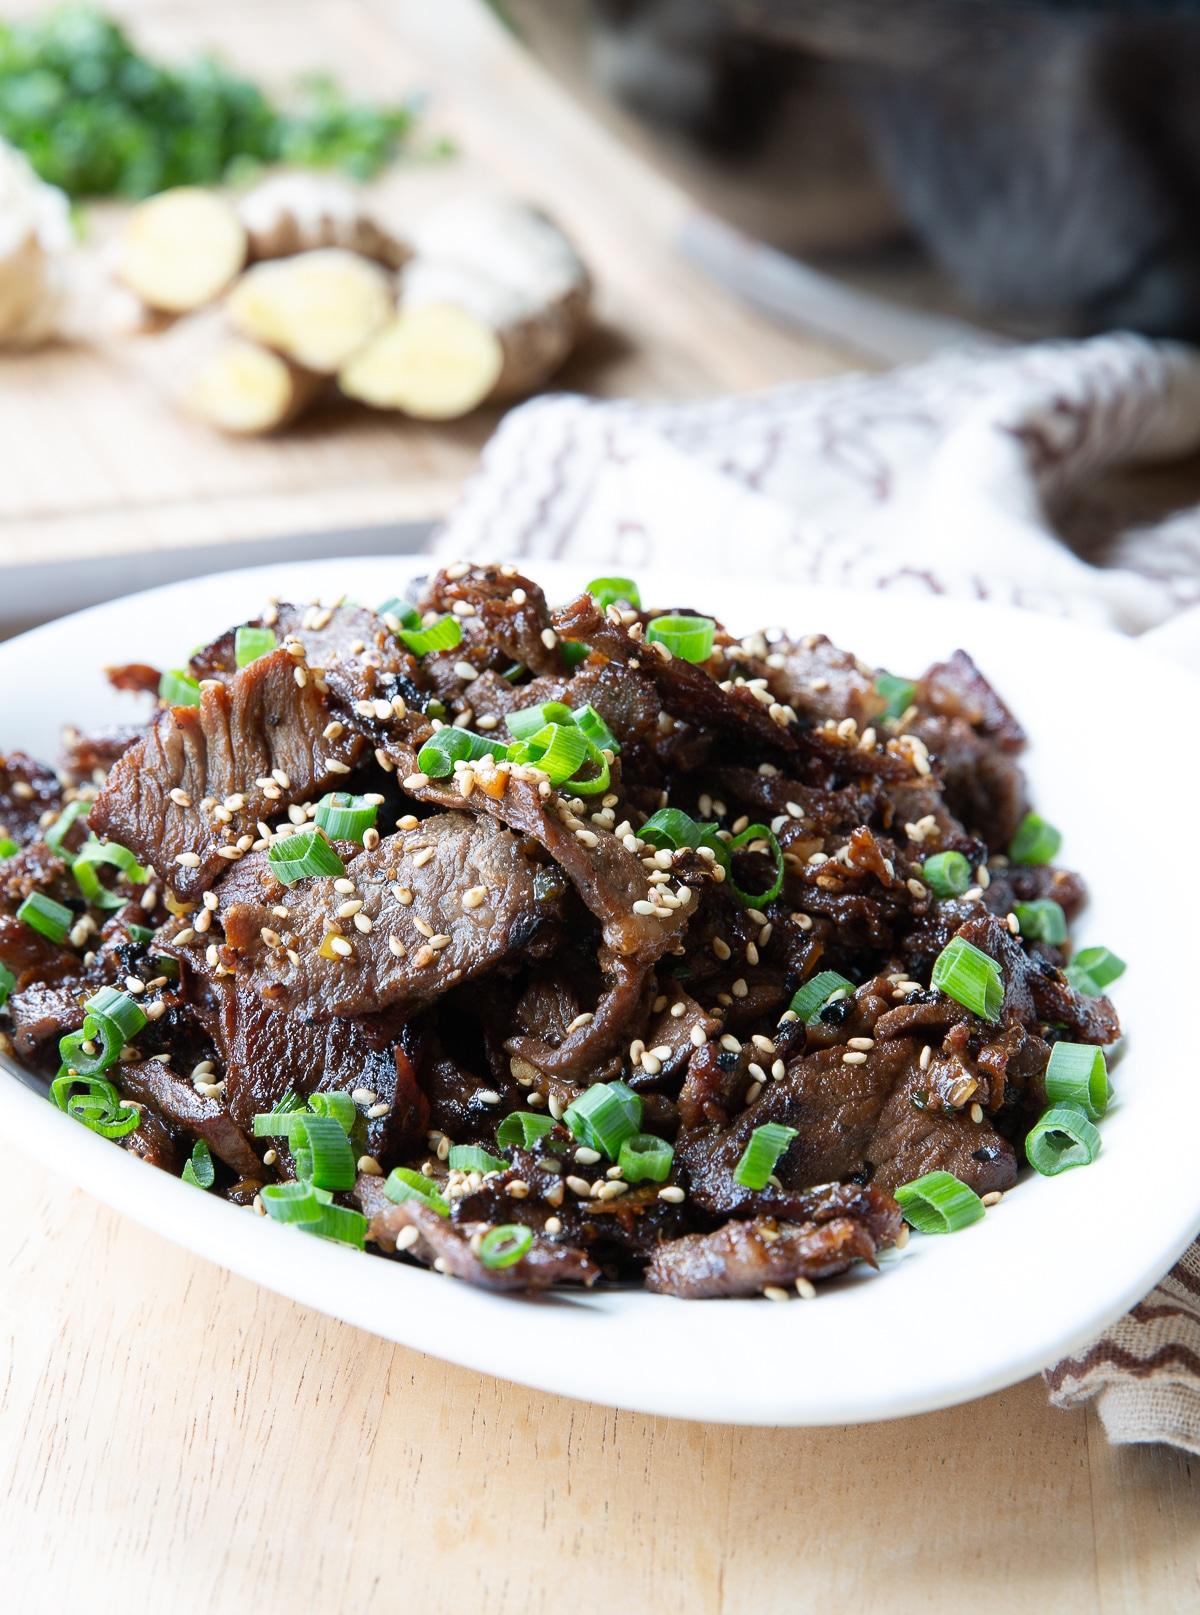 Bulgogi Beef Recipe #ASpicyPerspective #KoreanBBQ #KoreanBBQRecipe #KoreanBeef #Bulgogi #BulgogiRecipe #Beef #BeefBulgogi #Dinner #Asian